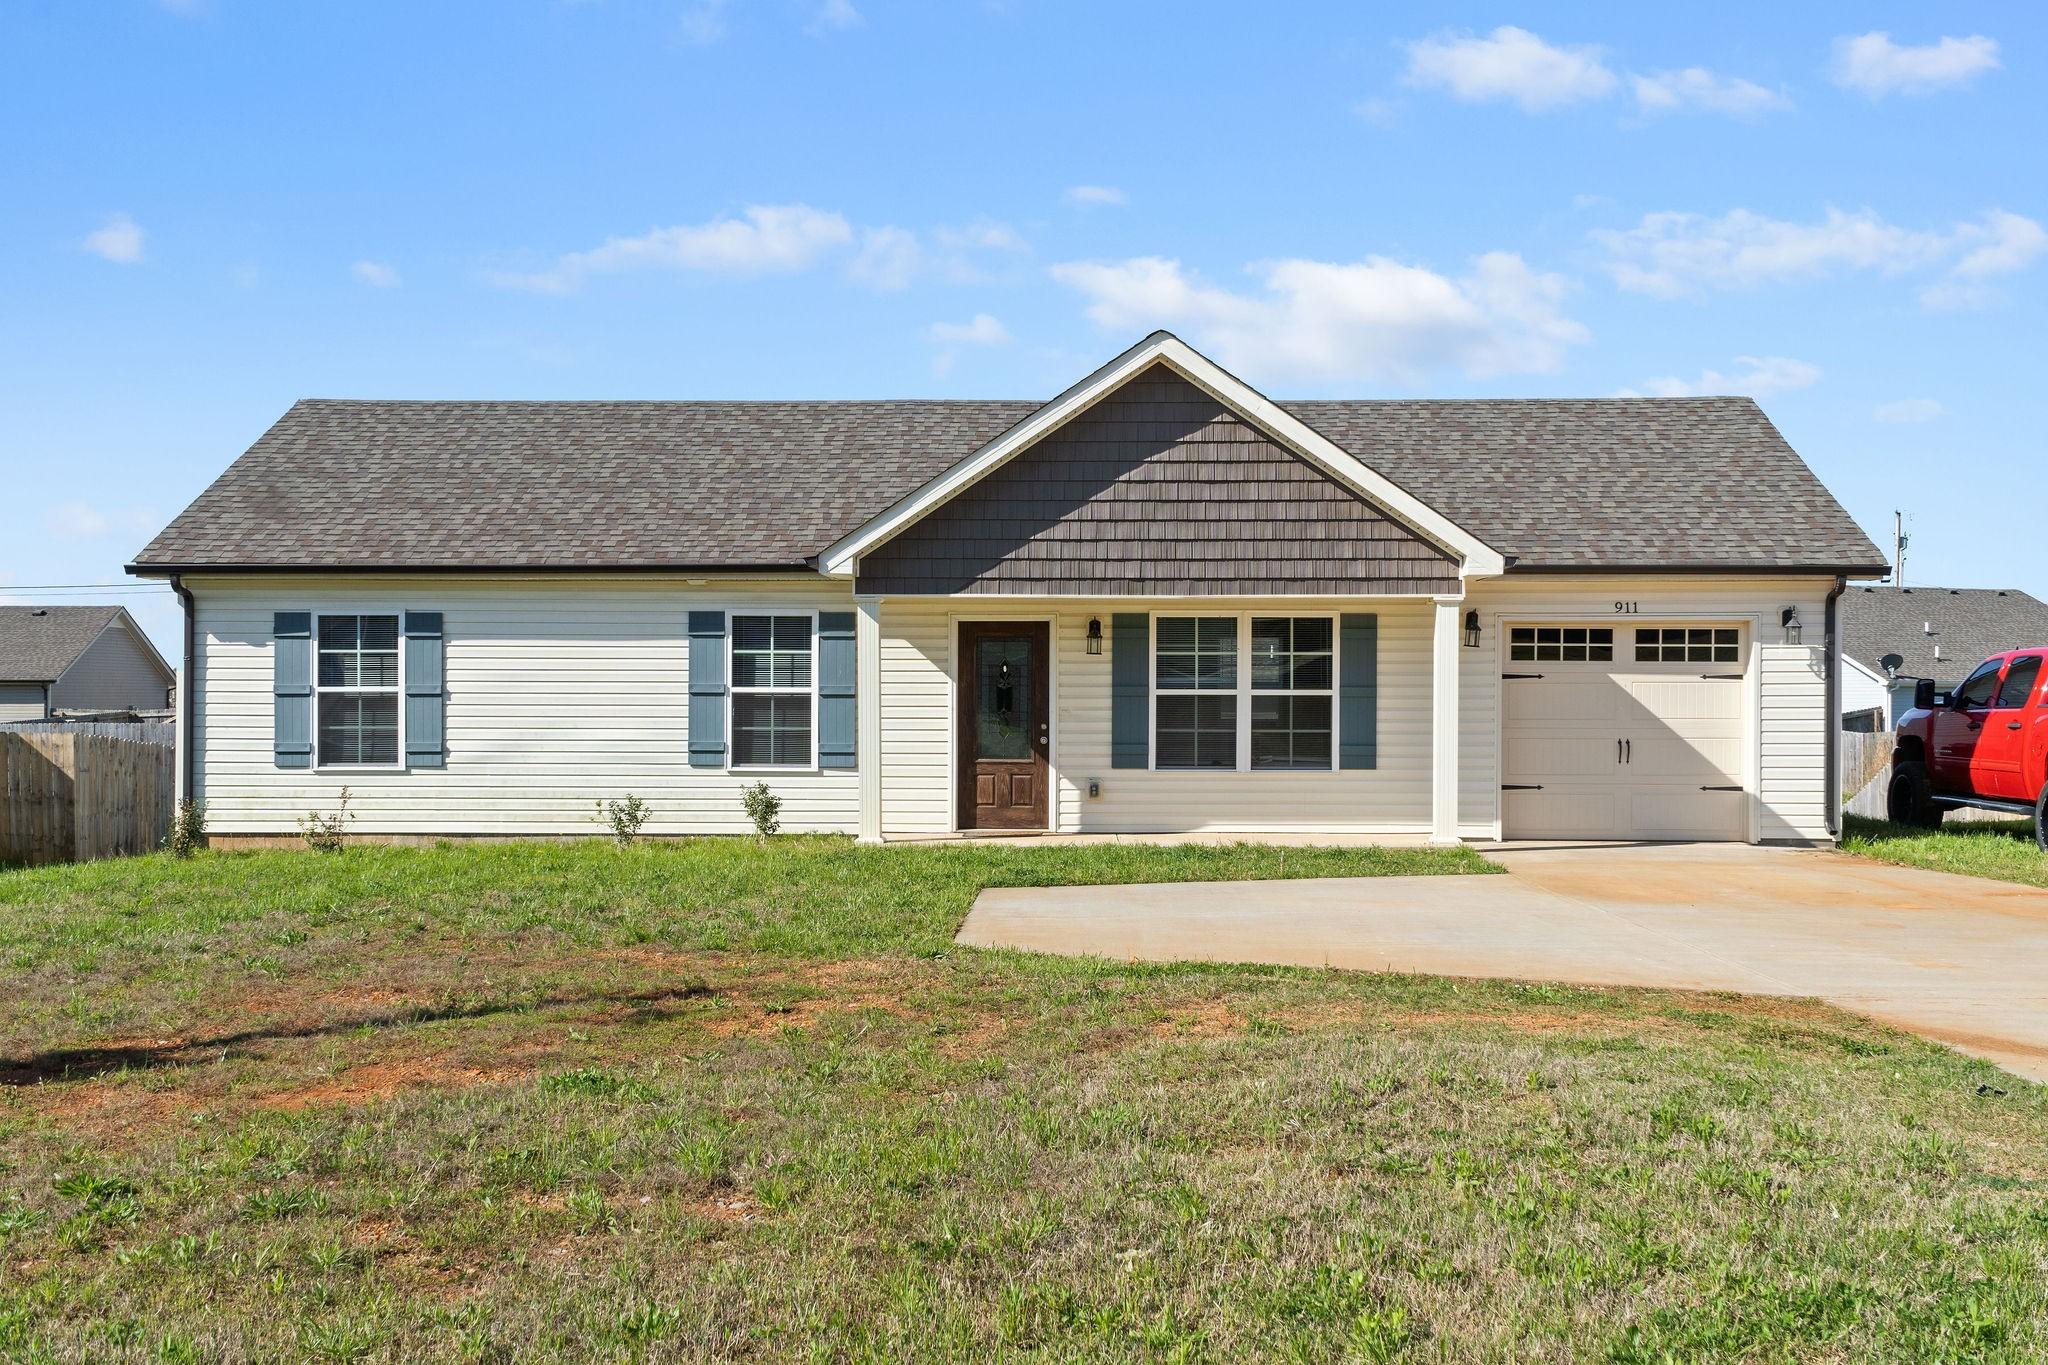 911 Hugh Hunter Rd Property Photo - Oak Grove, KY real estate listing